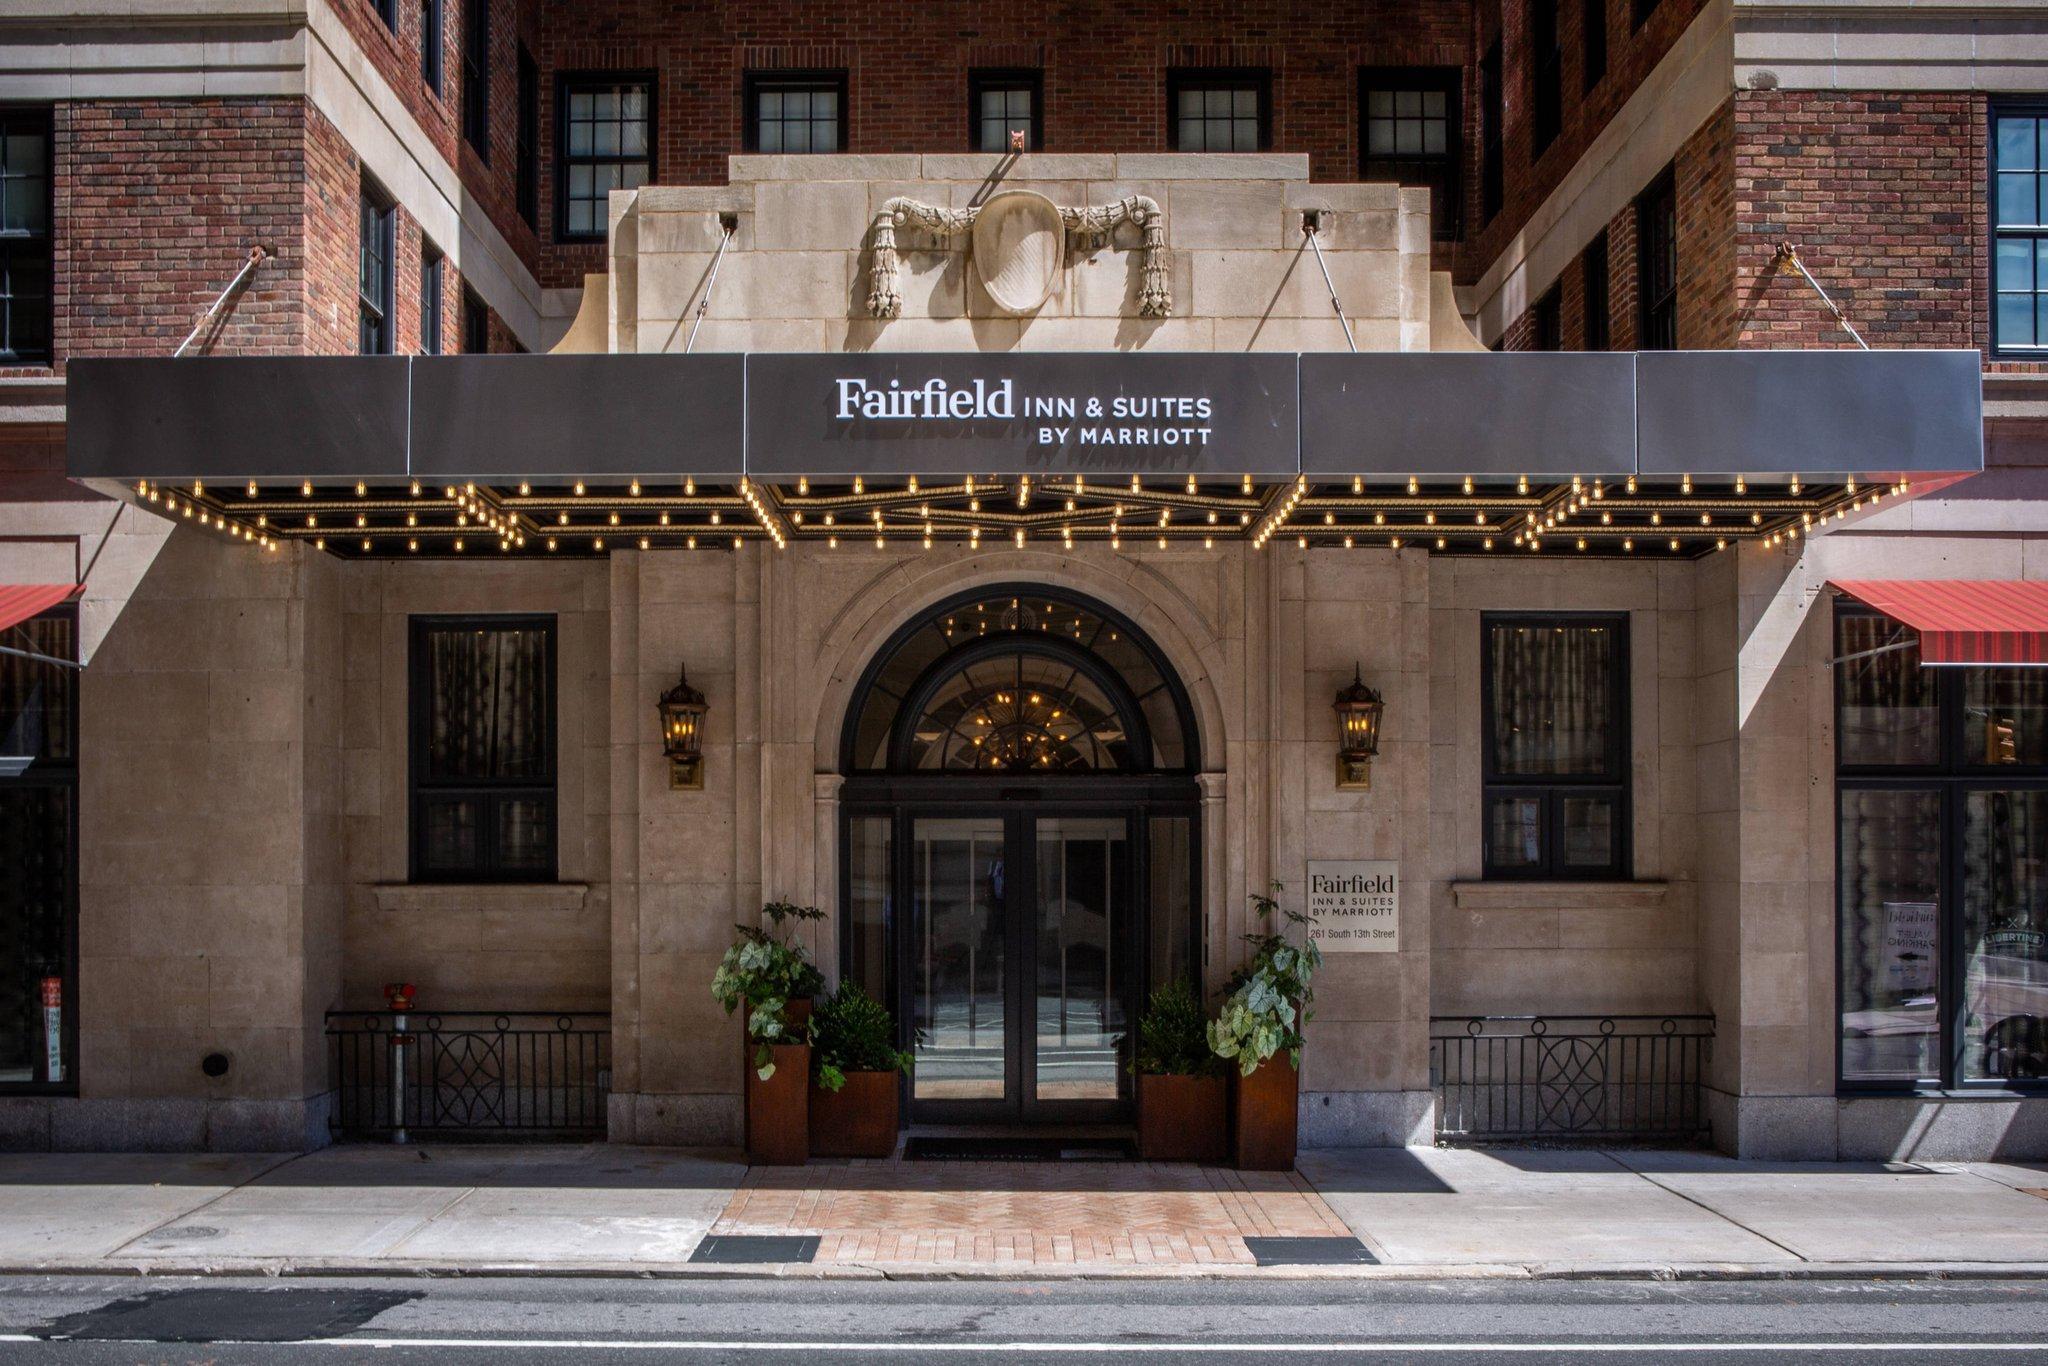 Fairfield Inn & Suites Philadelphia Downtown/Center City